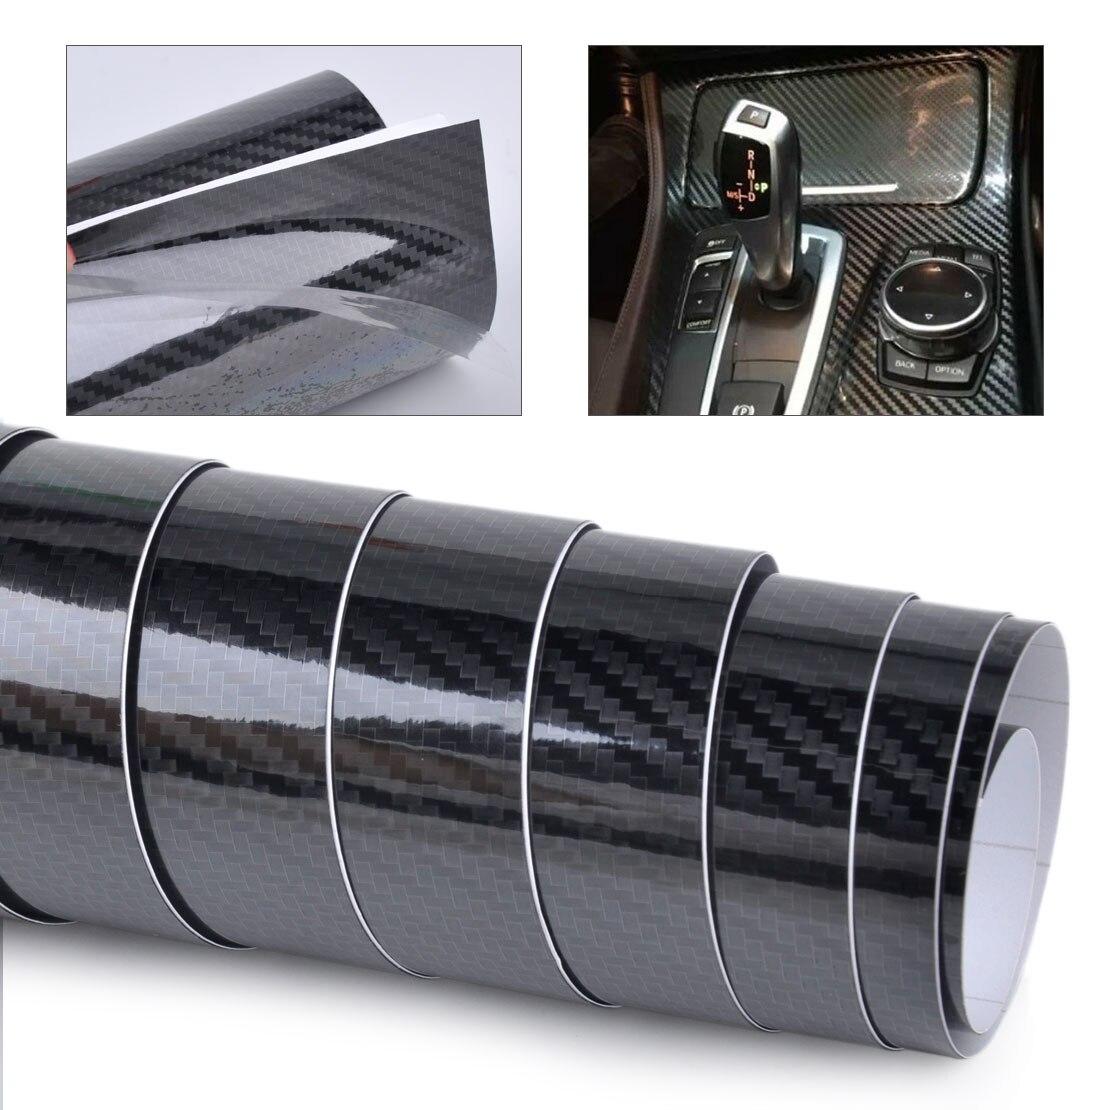 BelerNew 152x30cm negro 5D fibra de carbono textura coche Auto negro brillante Wrap Sticker película calcomanía rollo DIY Decoración Accesorios